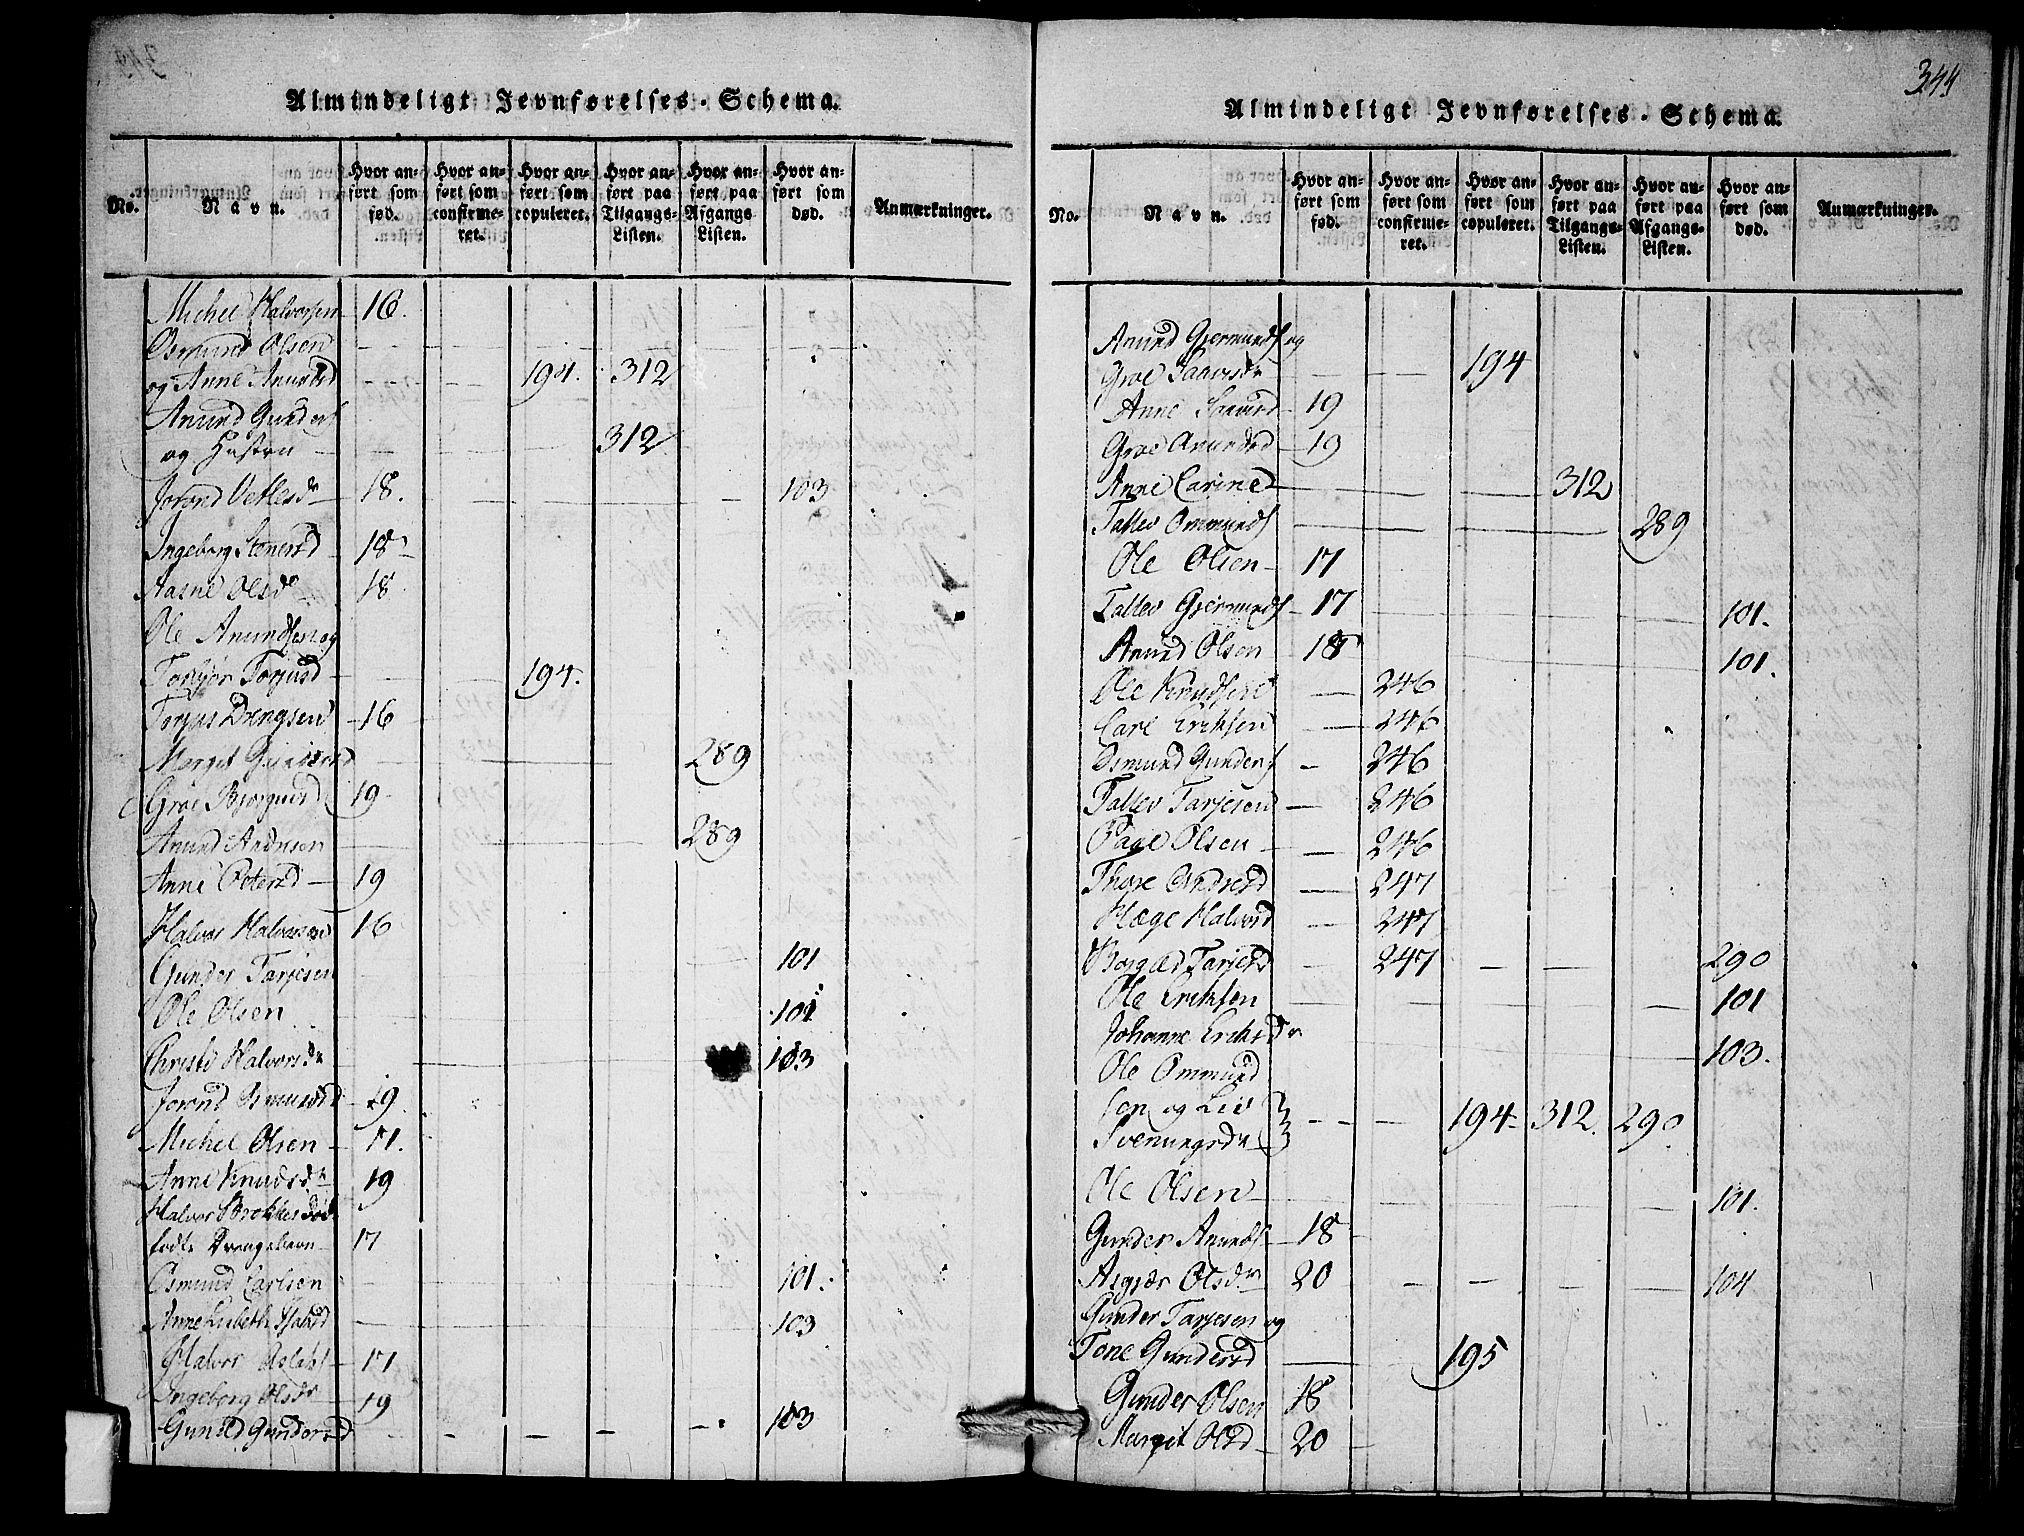 SAKO, Mo kirkebøker, F/Fb/L0001: Ministerialbok nr. II 1, 1814-1844, s. 344